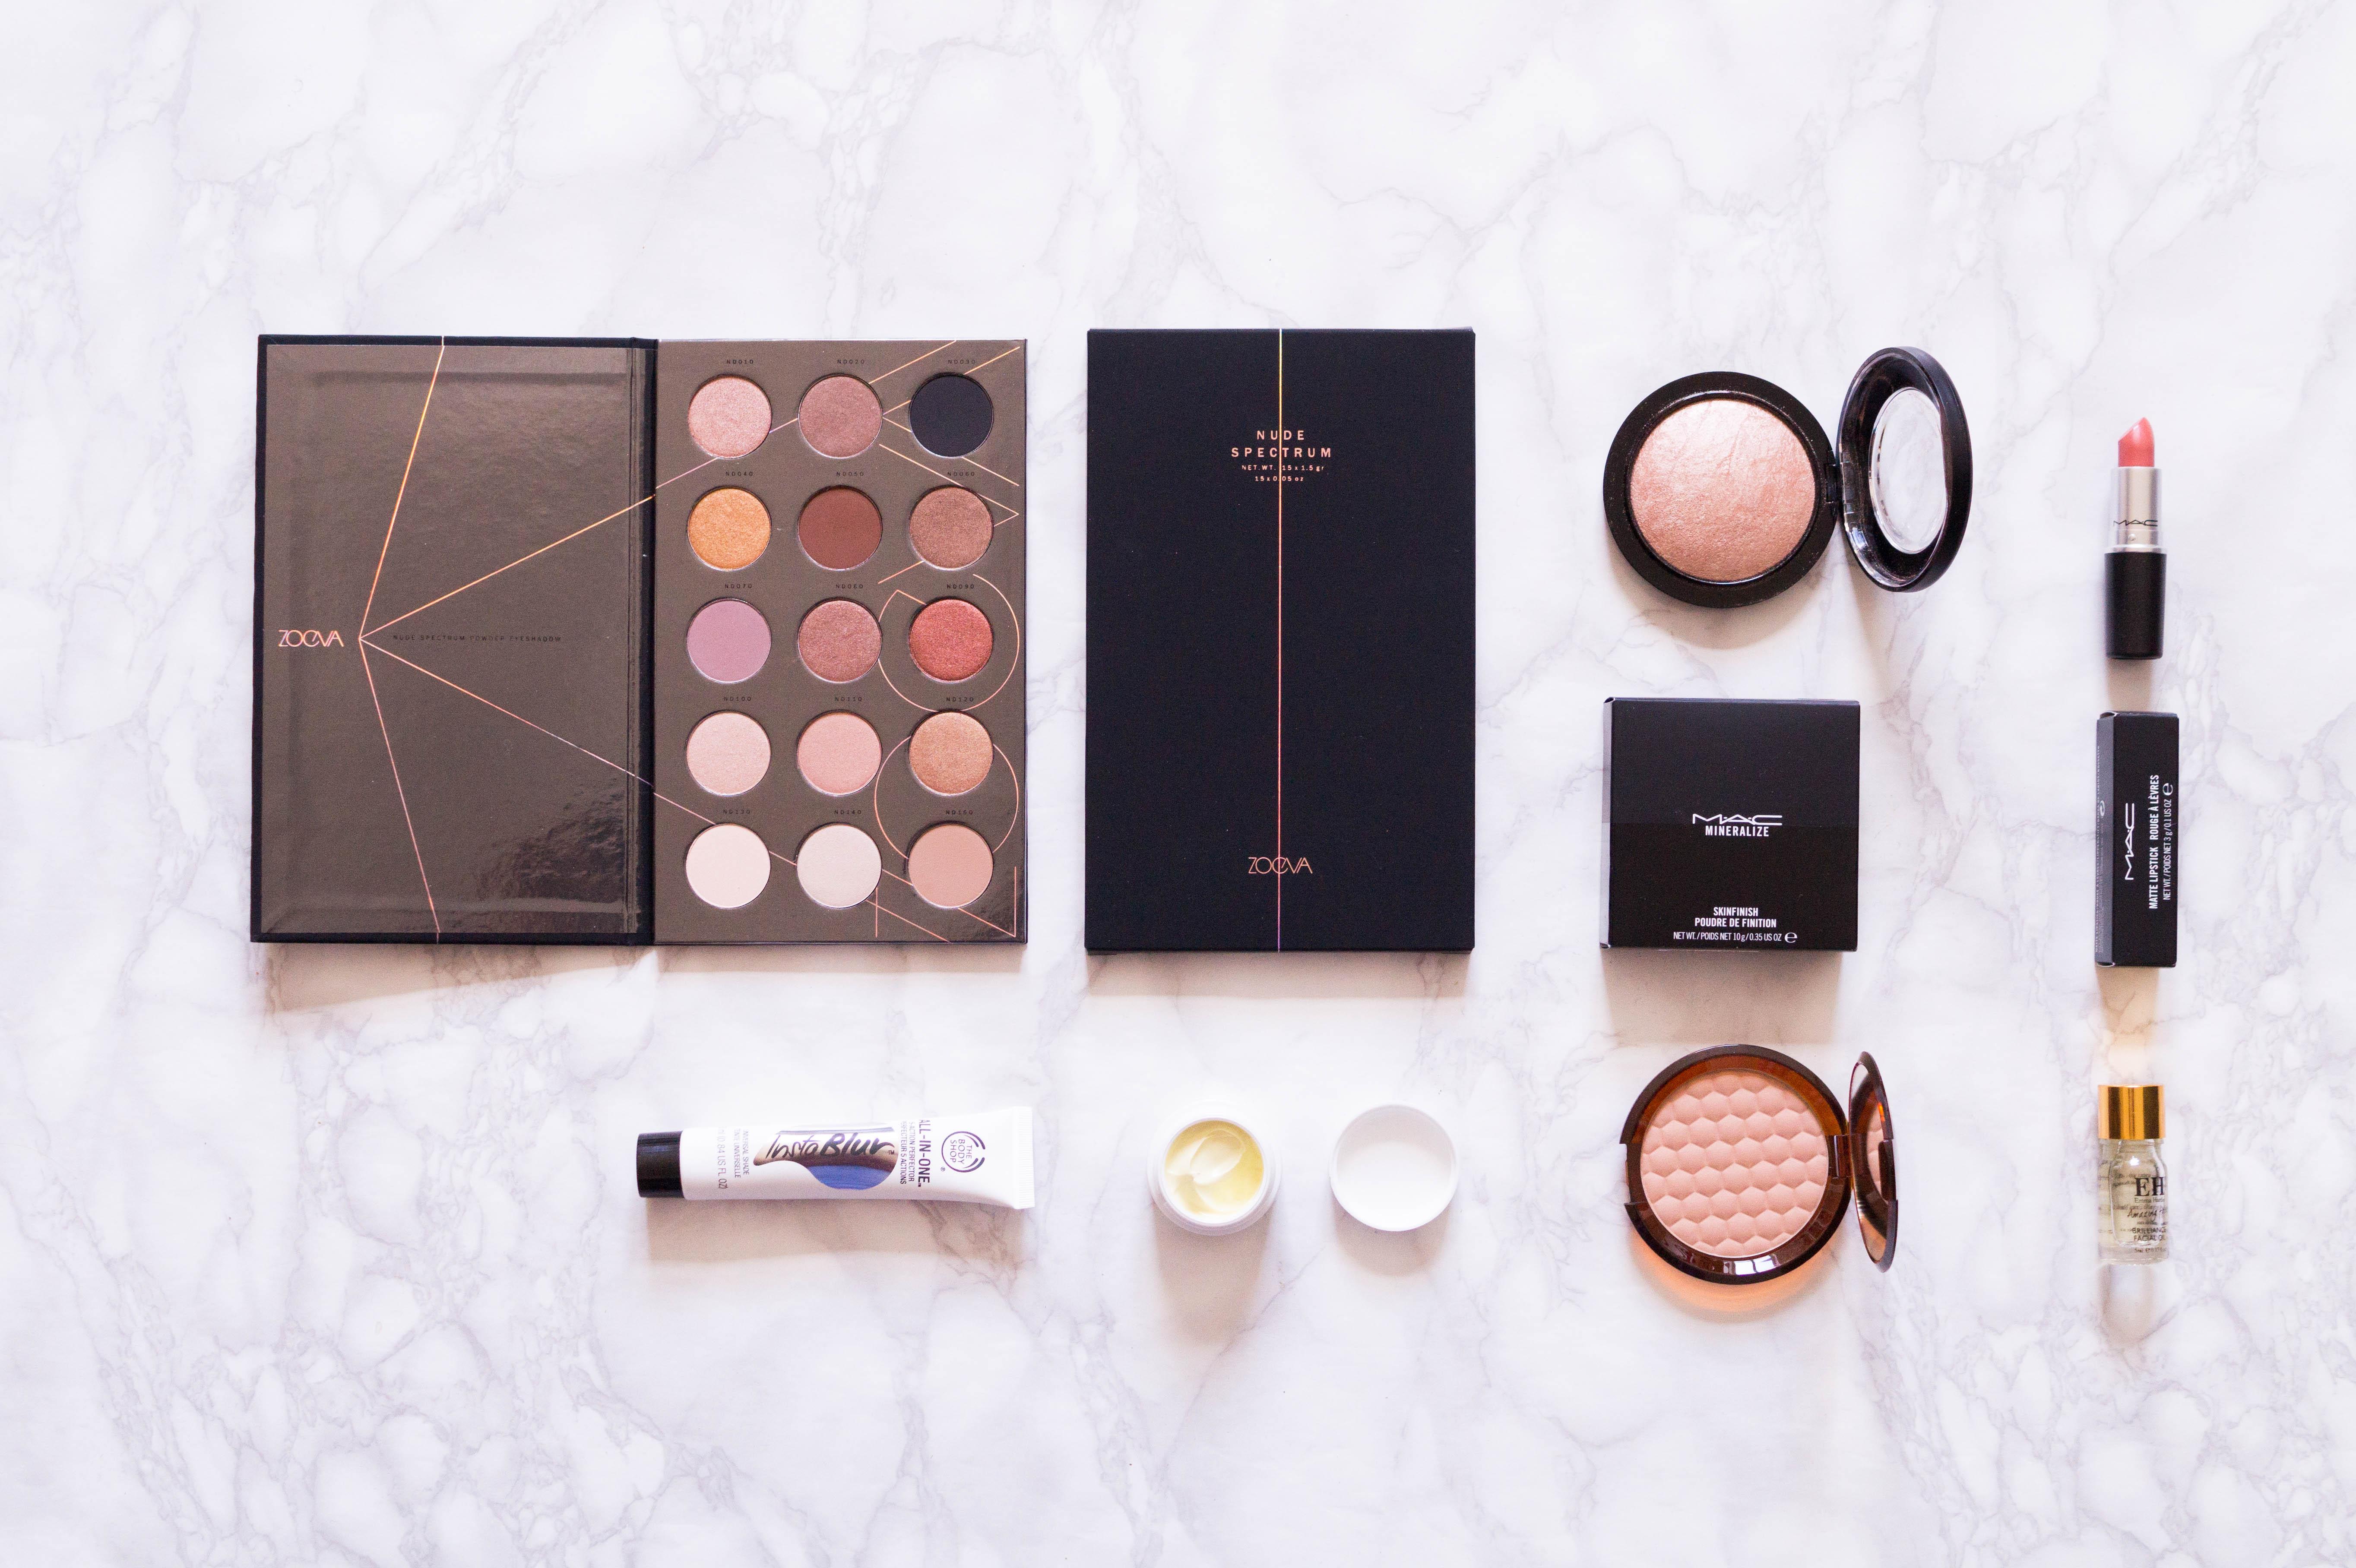 makeup haul flatlay zoeva mac lipstick soft and gentle highlighter the body shop bronzer